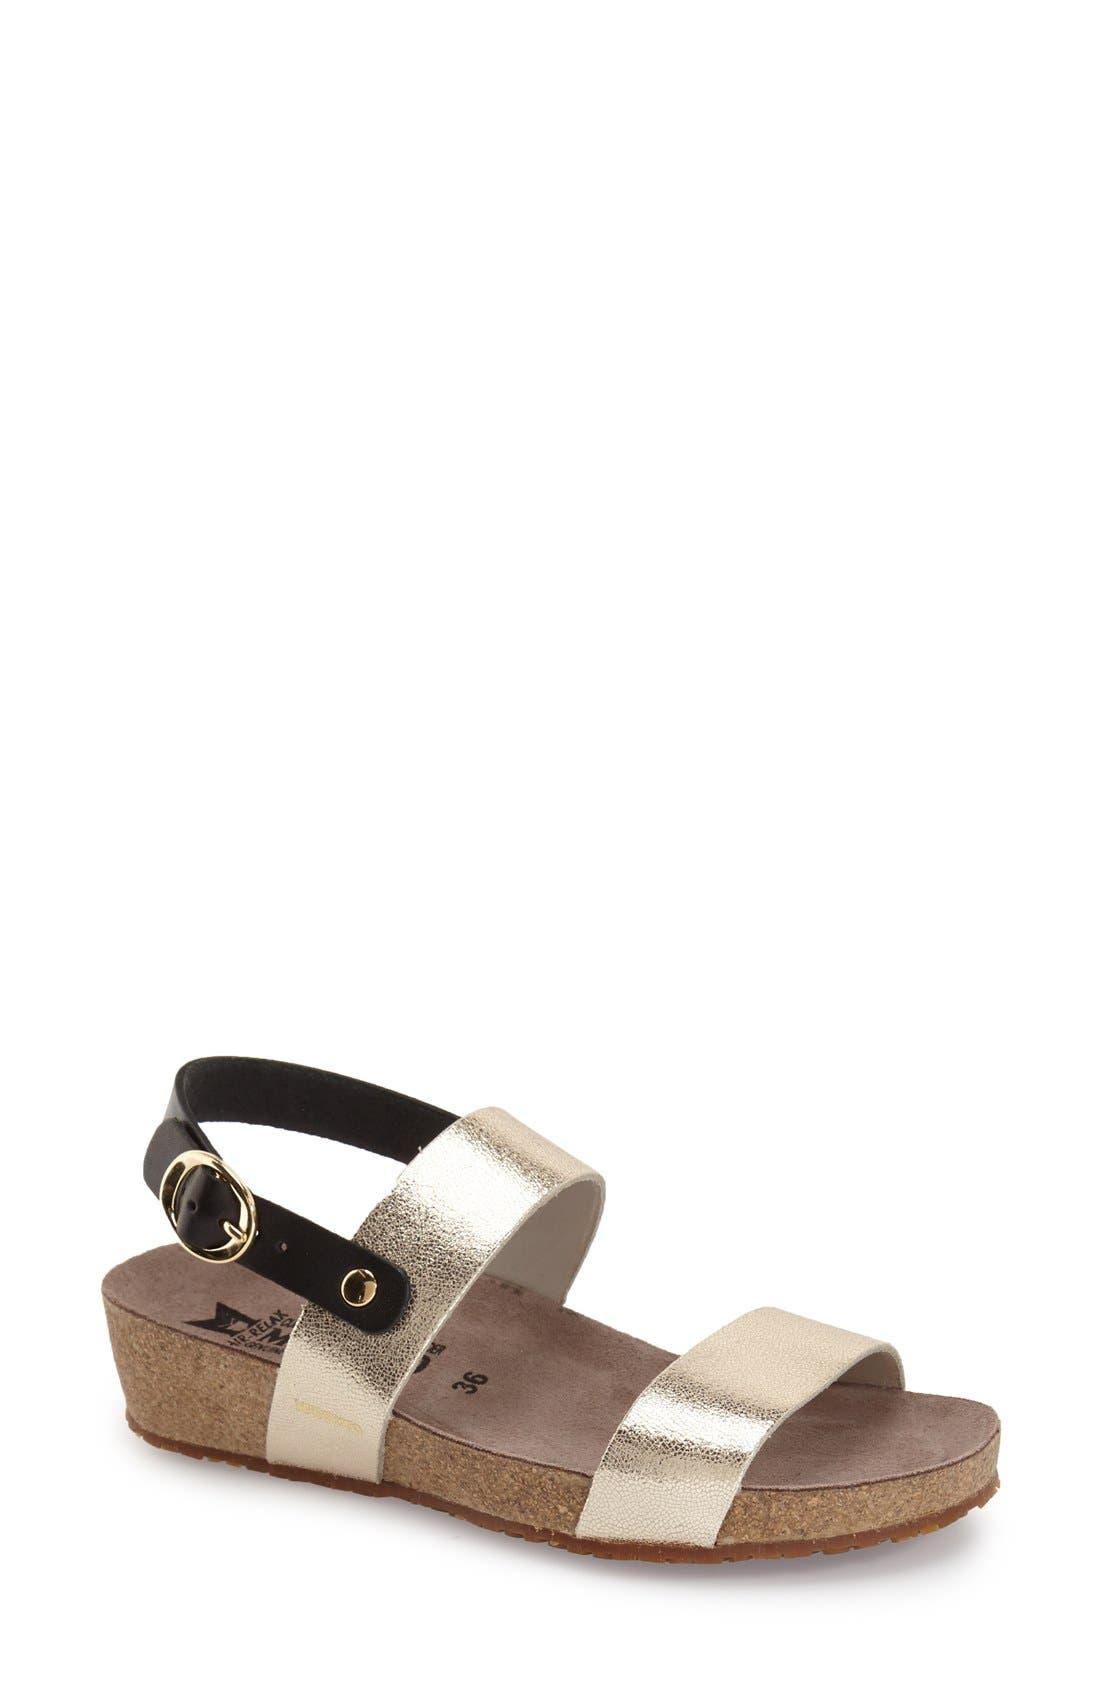 'Italia' Sandal,                             Main thumbnail 1, color,                             Platinum Leather